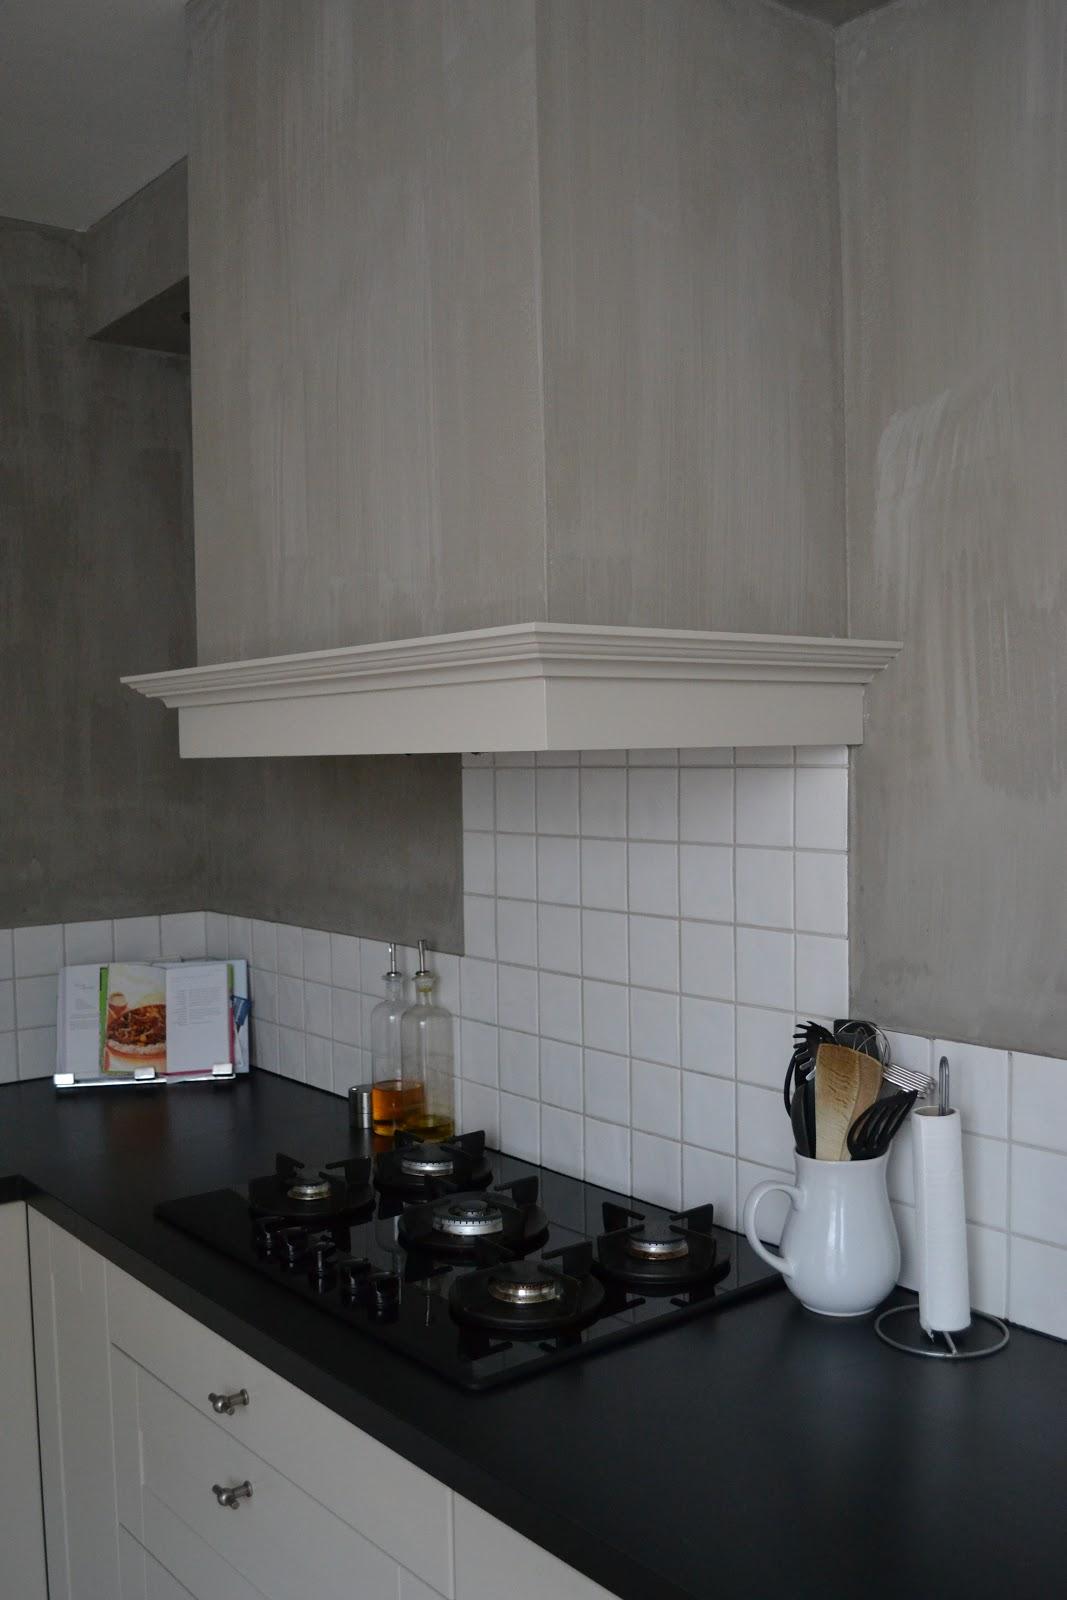 Verlichting Keuken Zonder Bovenkasten : Landelijke Keuken Zonder Bovenkastjes : Keukenverlichting kiezen Tips